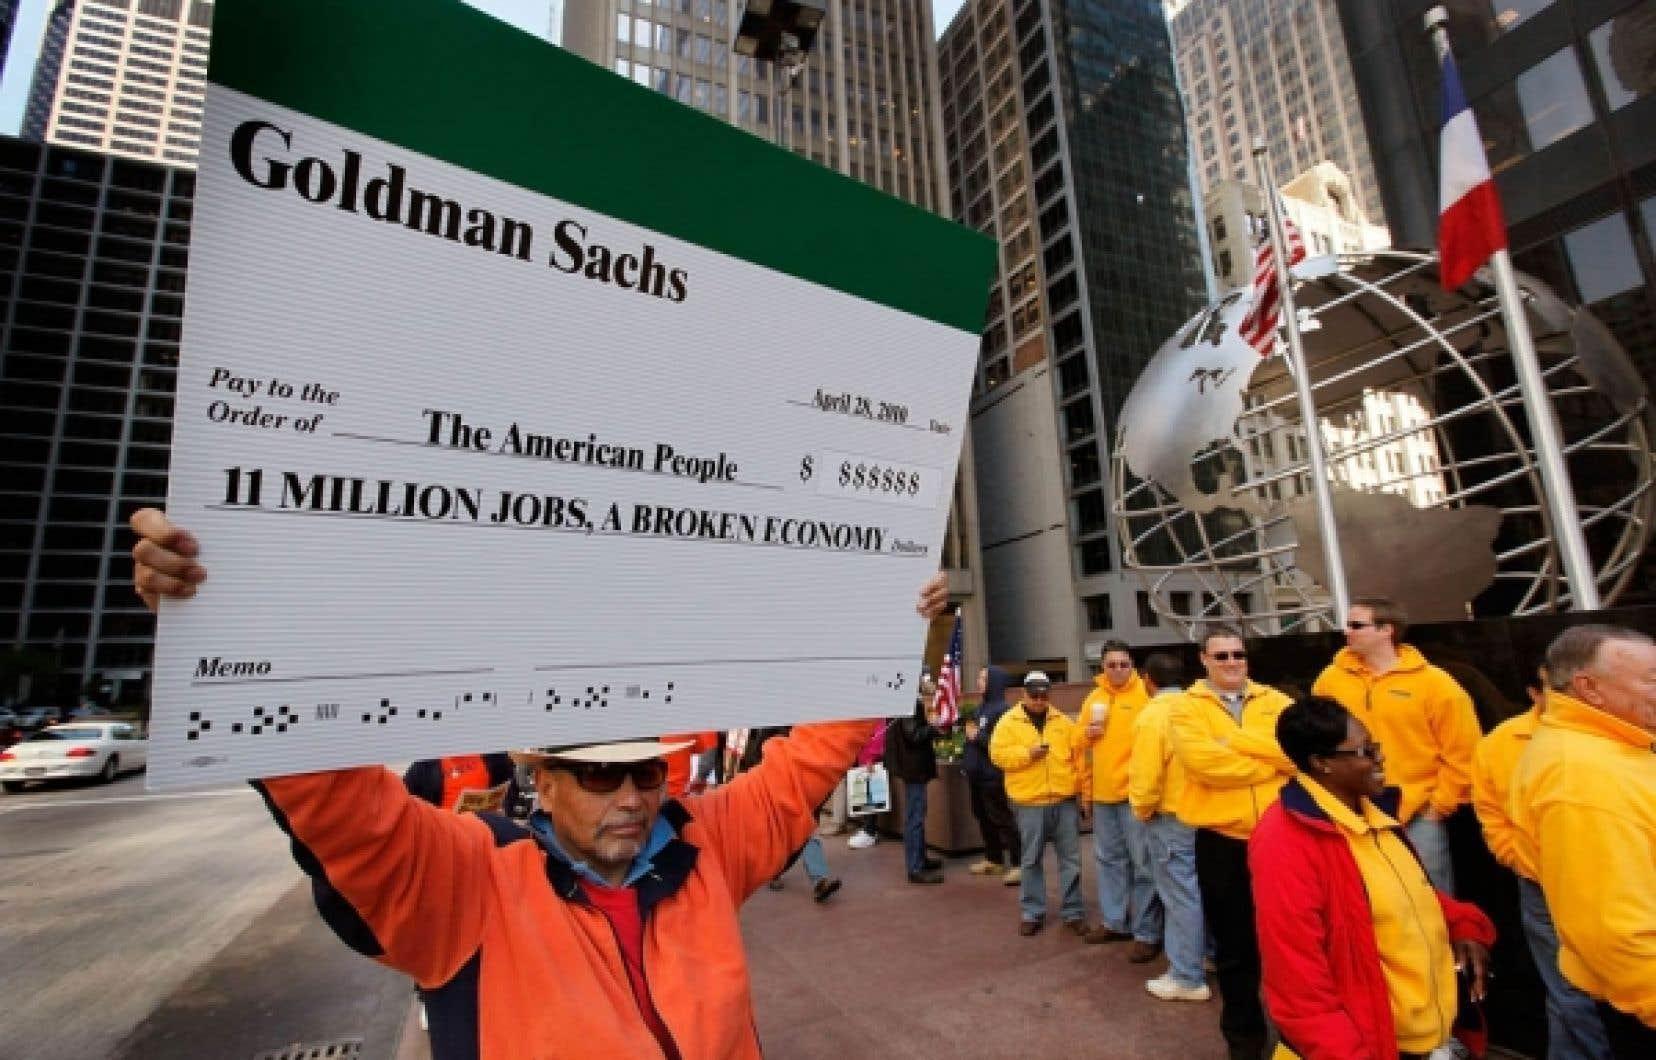 Manifestation à New York cette semaine devant Goldman Sachs